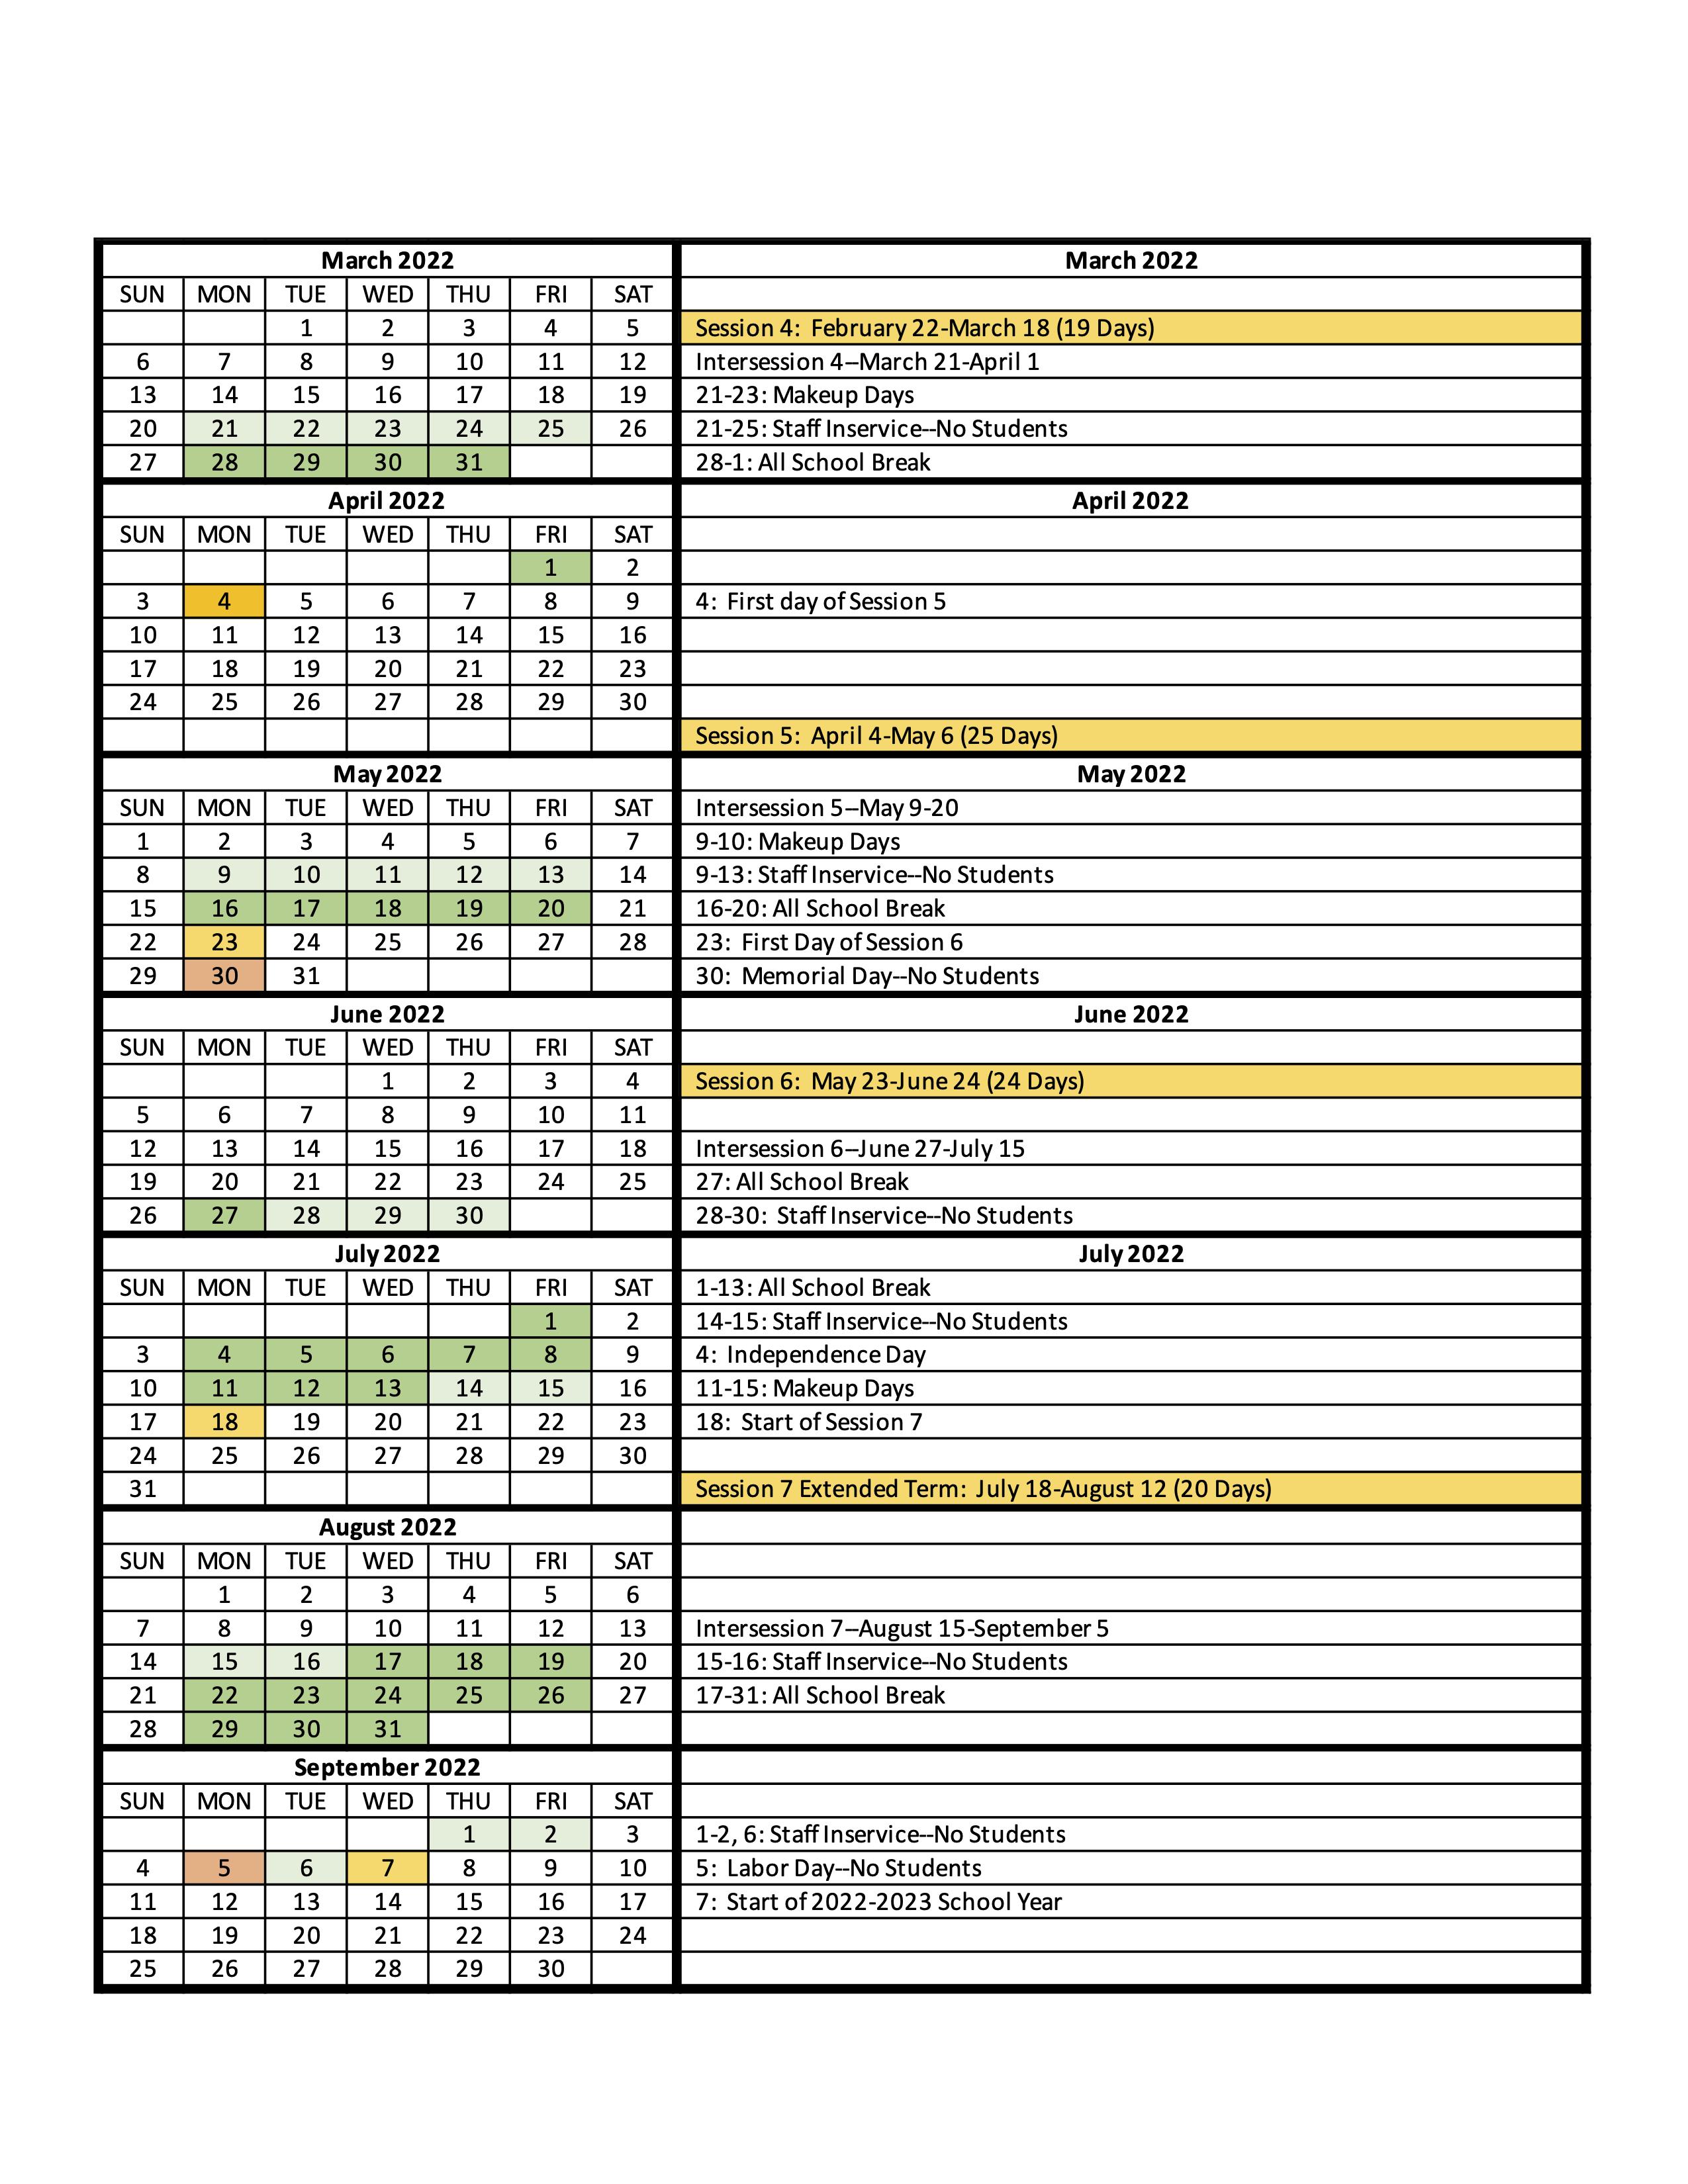 Calendar pg 2